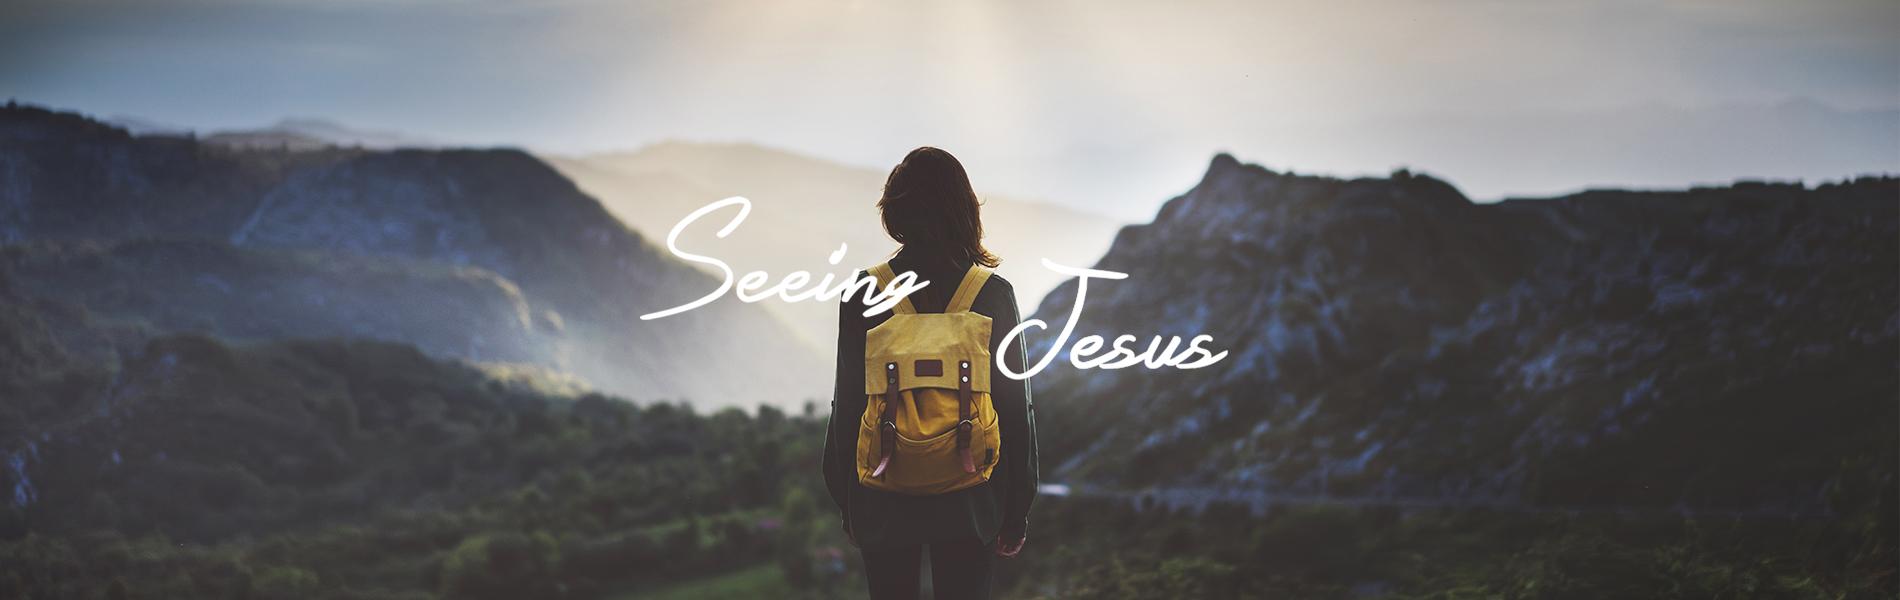 170719_seeingJesus-English_V2 New Creation TV | Broadcasting the Gospel of Jesus